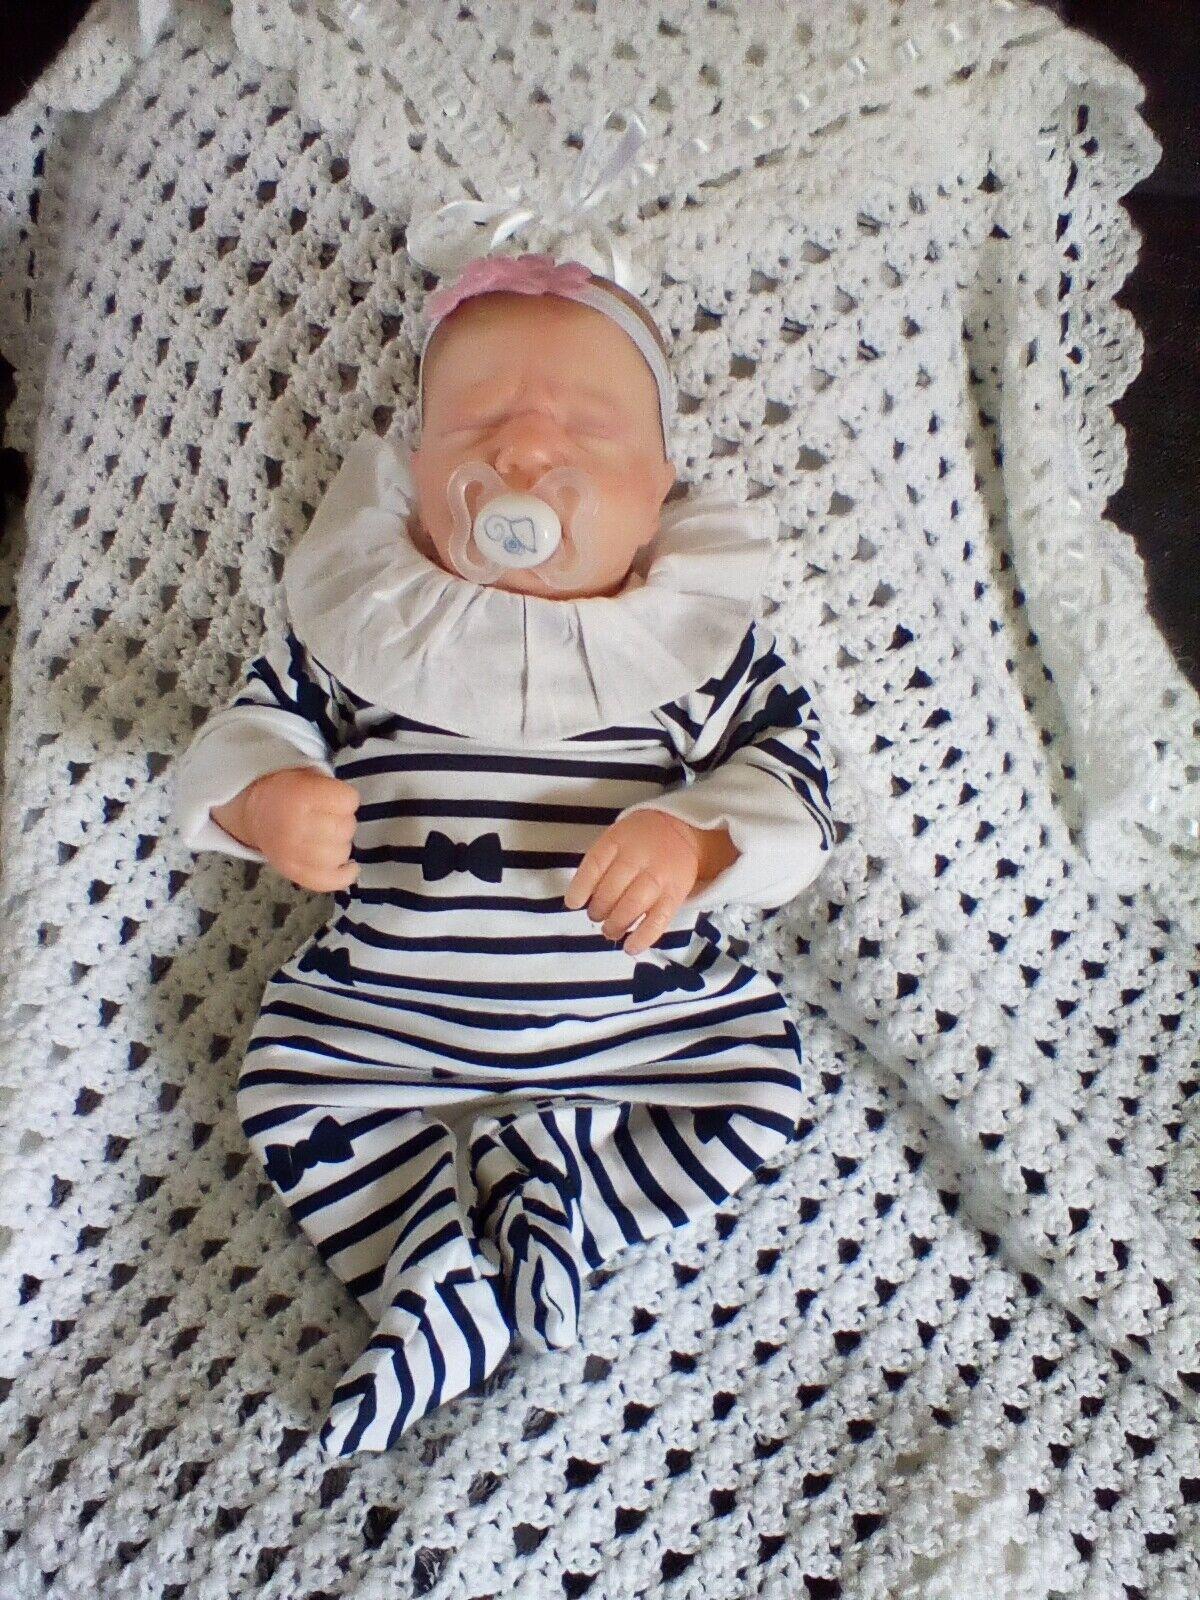 Beautiful reborn baby girl from the Realborn Blake kit